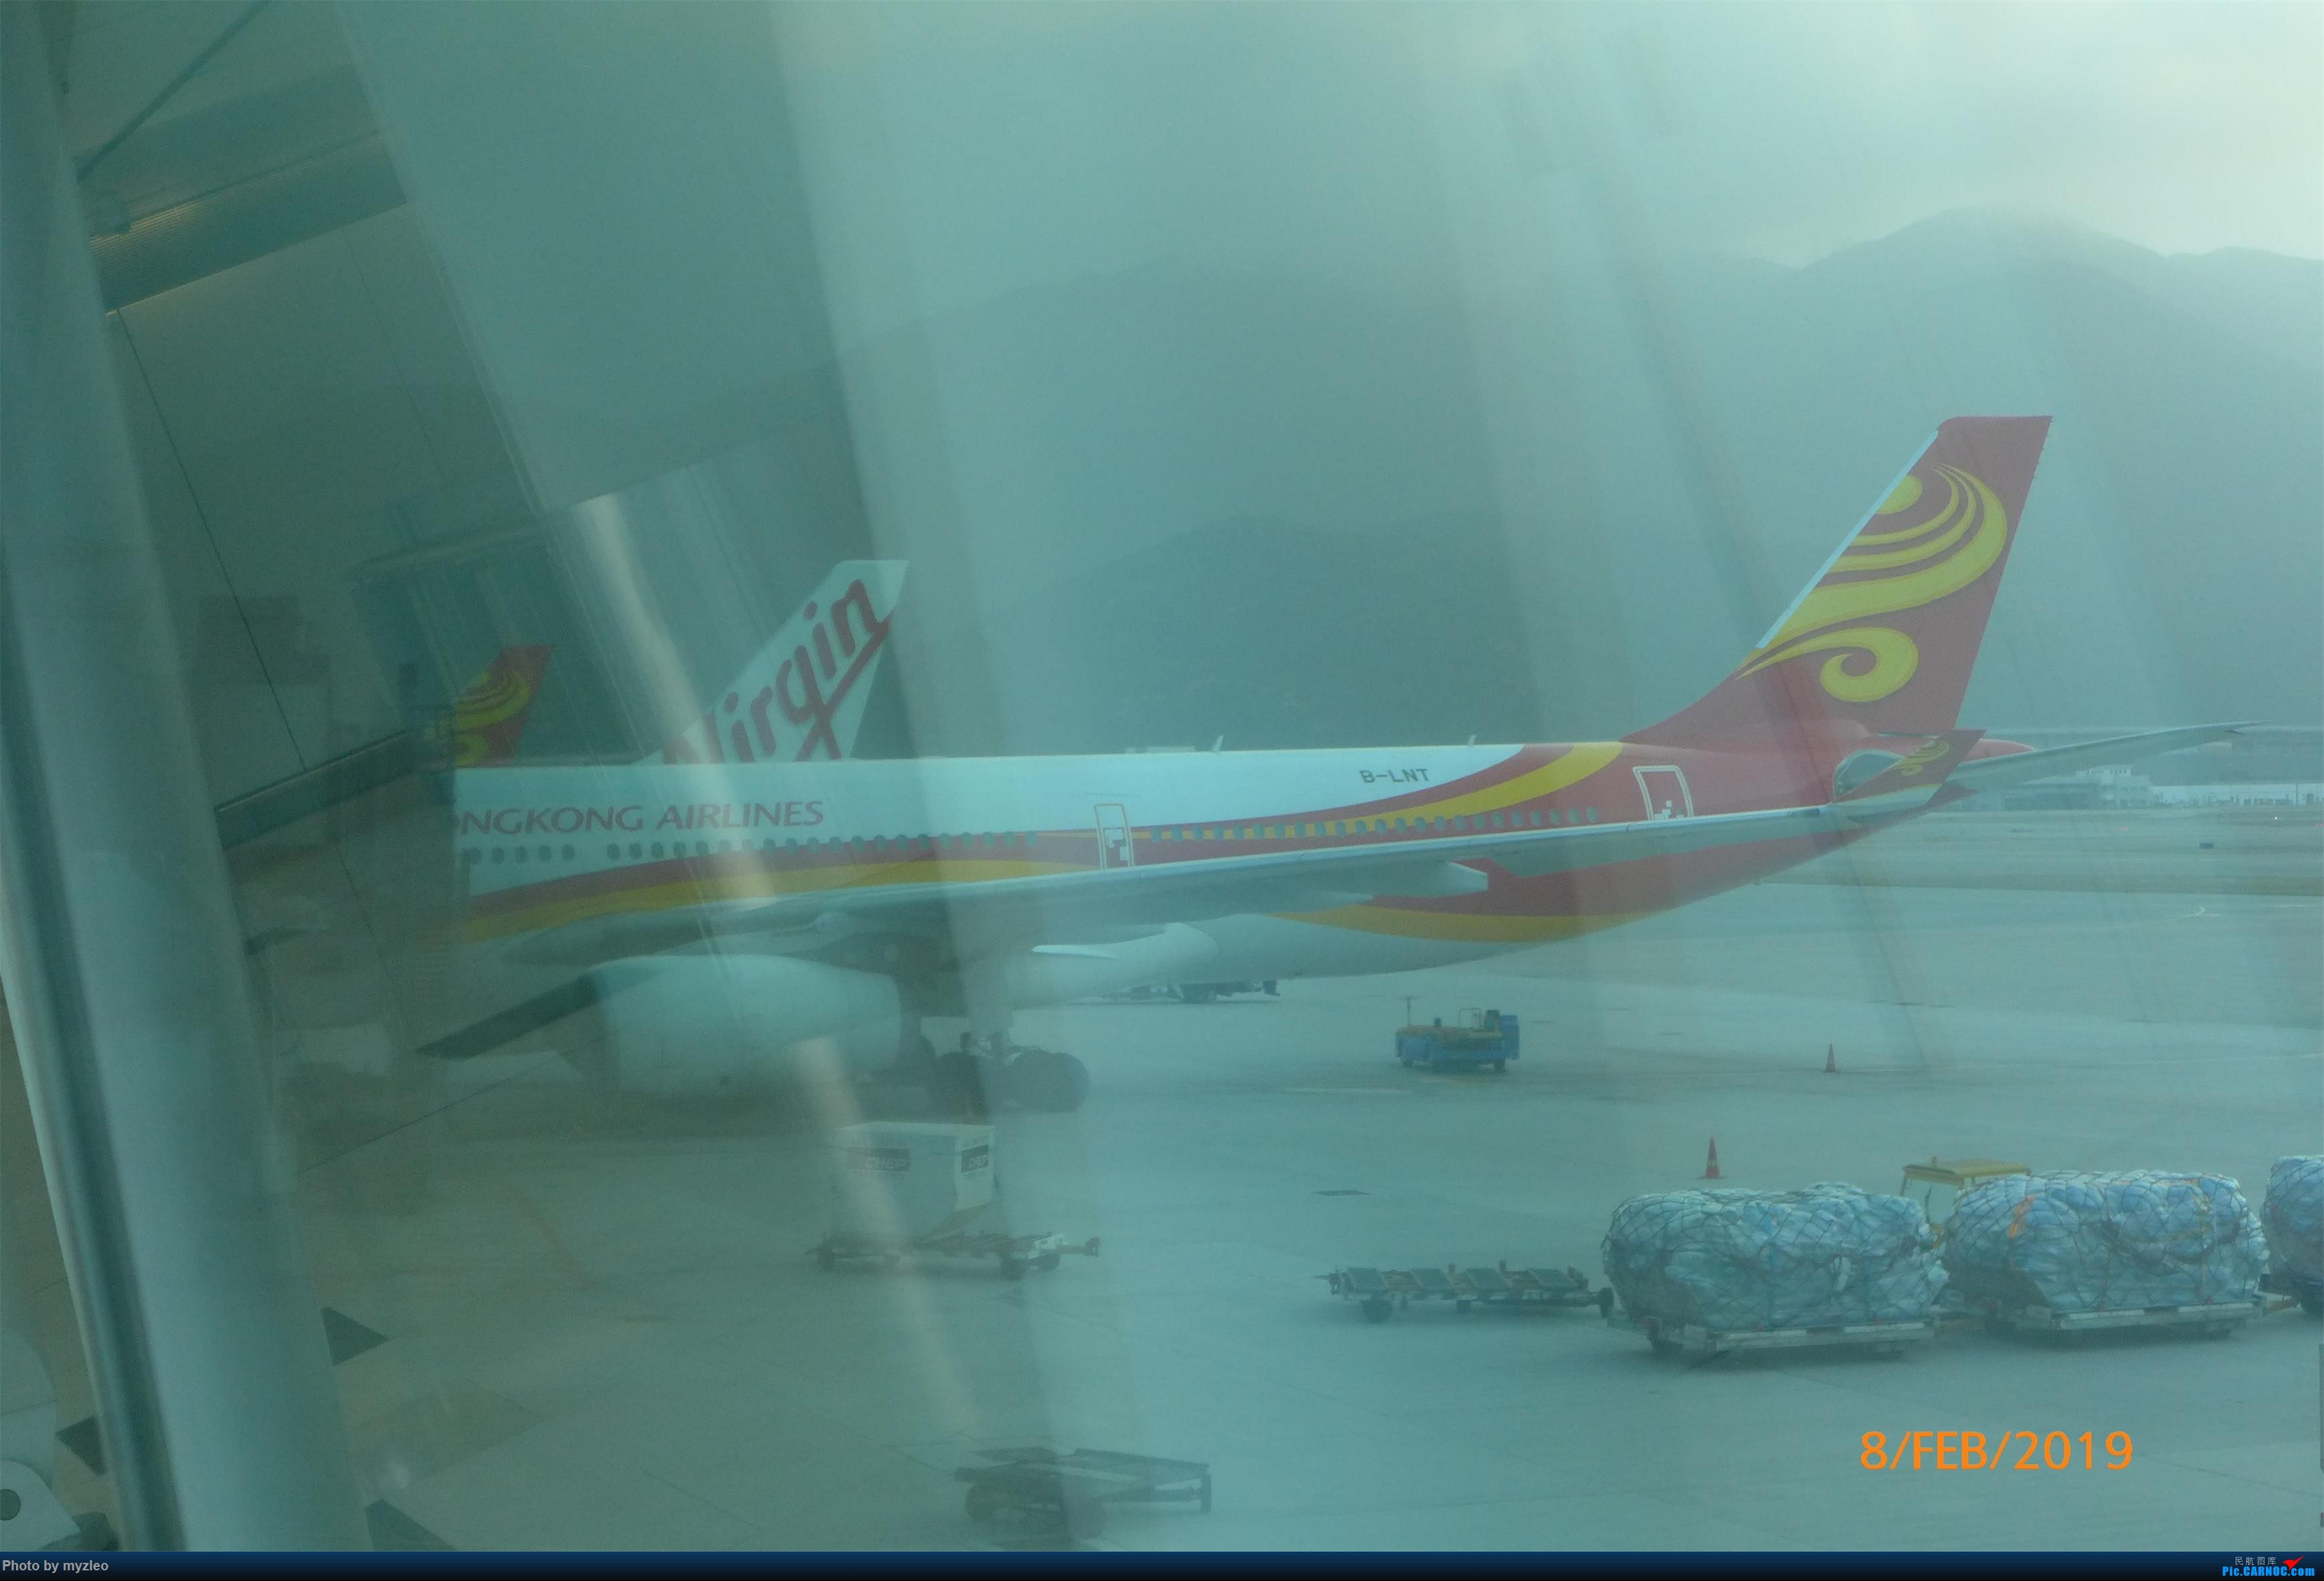 Re:[原创]【myzleo的游记4.5】十年之约(5)在香港的最后一天,搭乘港航333回沪 AIRBUS A330-300 B-LNT 中国香港国际机场